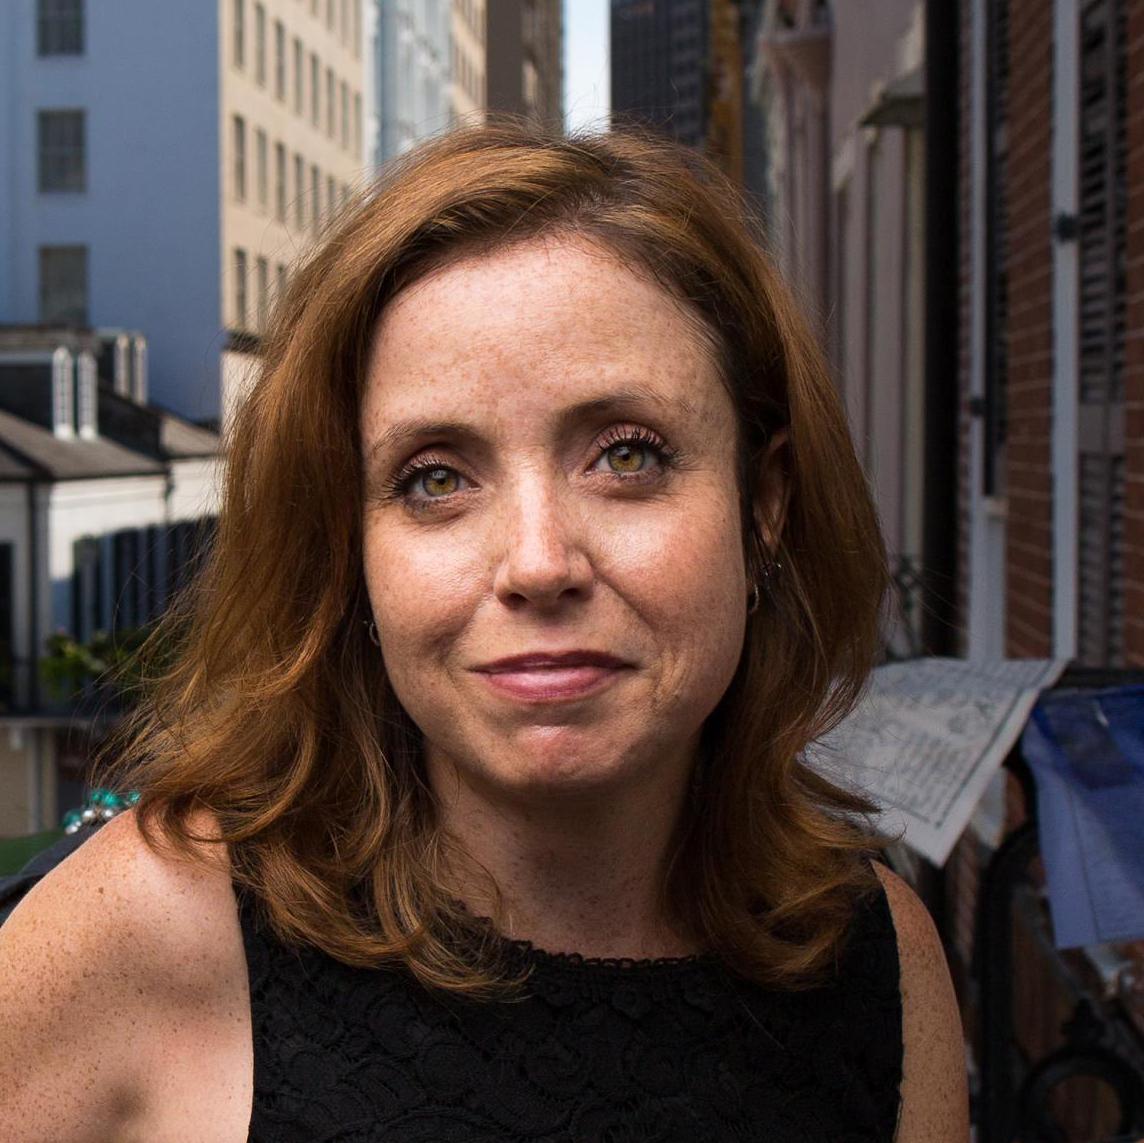 Danielle Nierenberg headshot